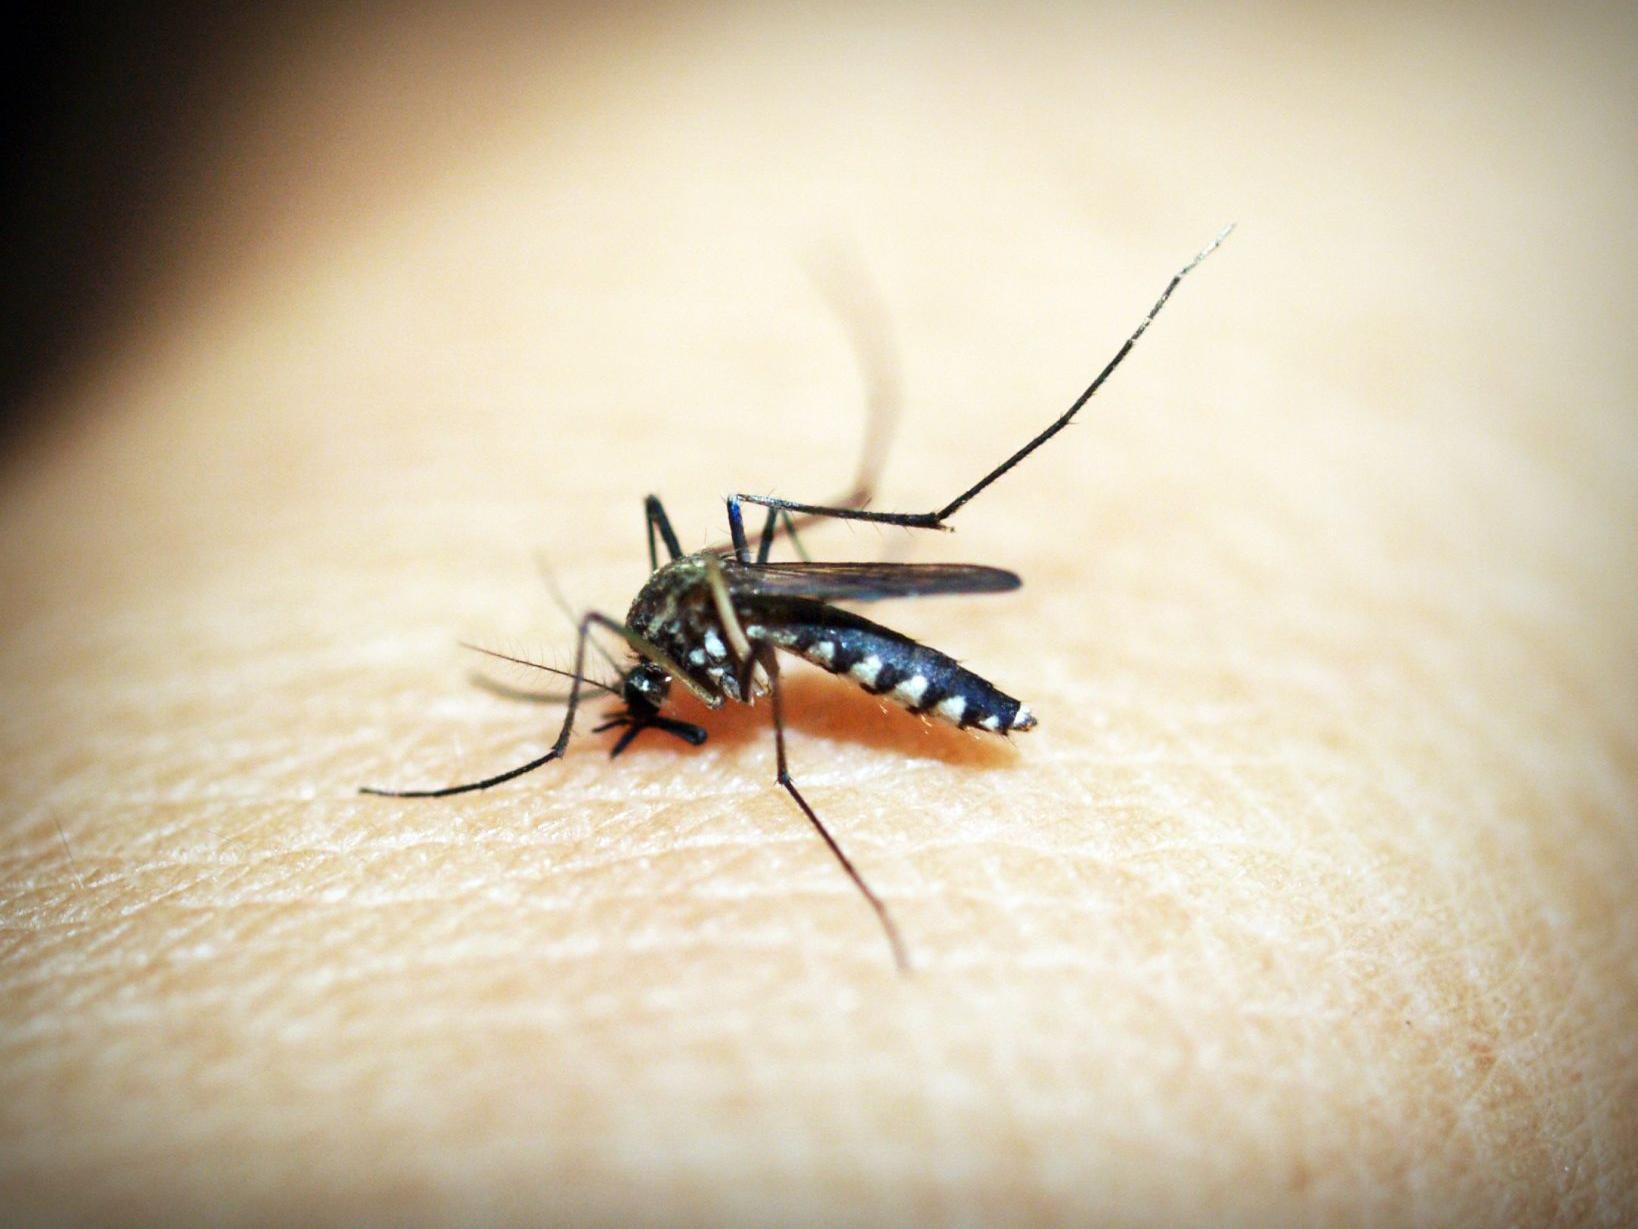 West Nile virus on the rise in eastern Nebraska, health officials say